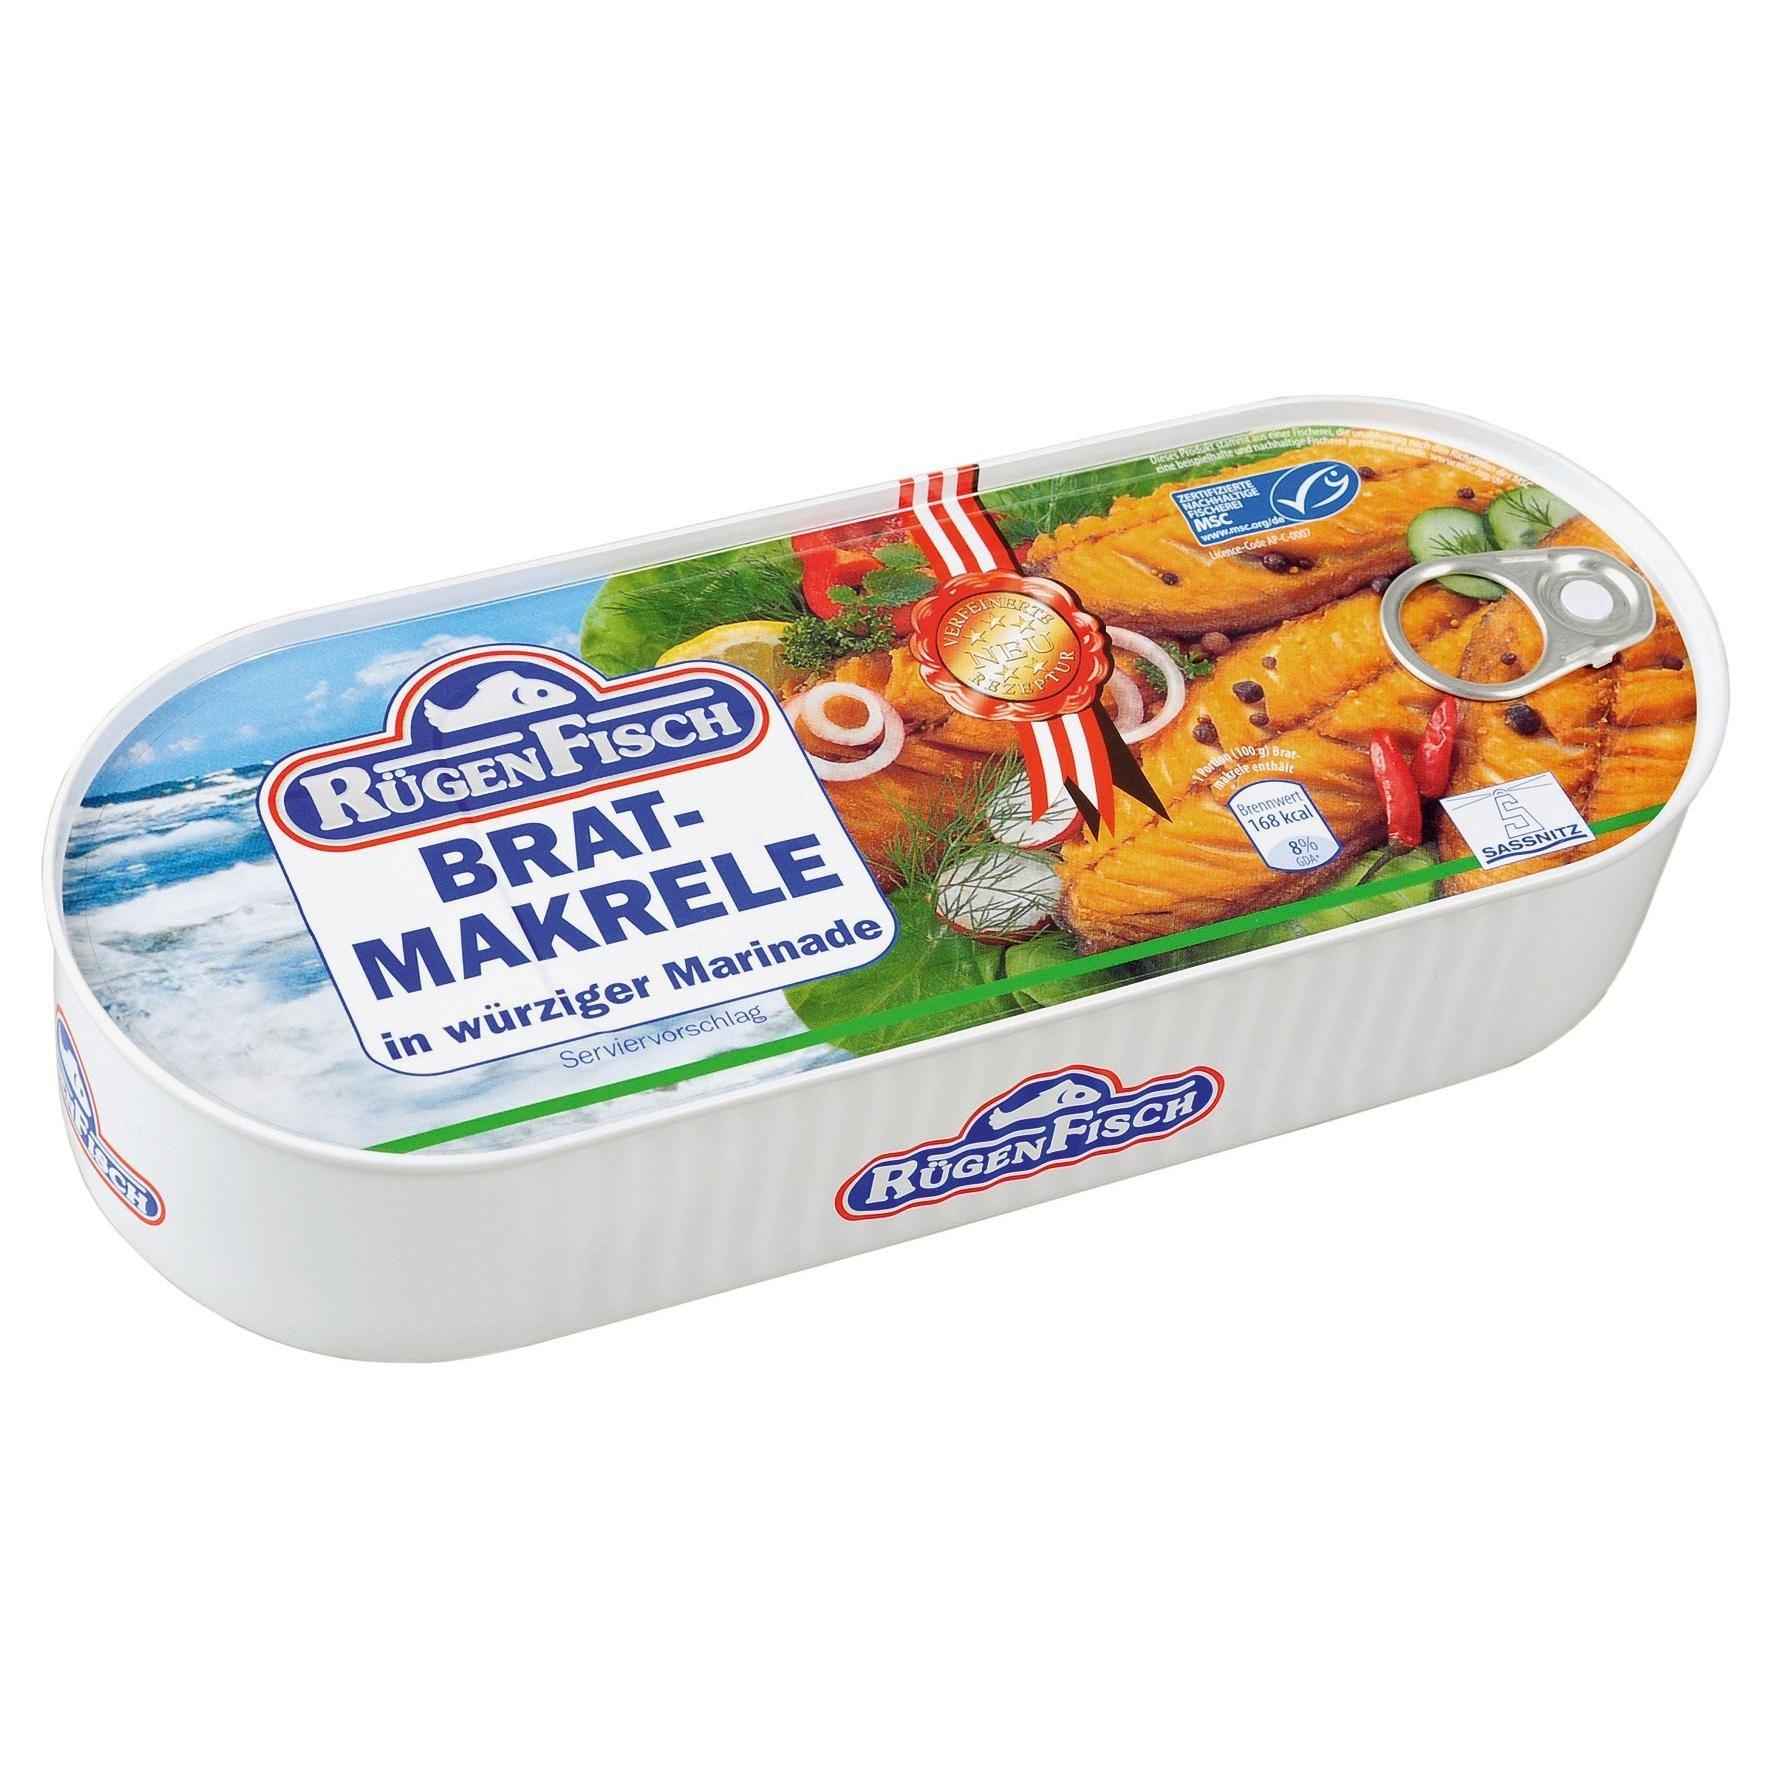 Rügen Fisch Bratmakrele 300g/500g